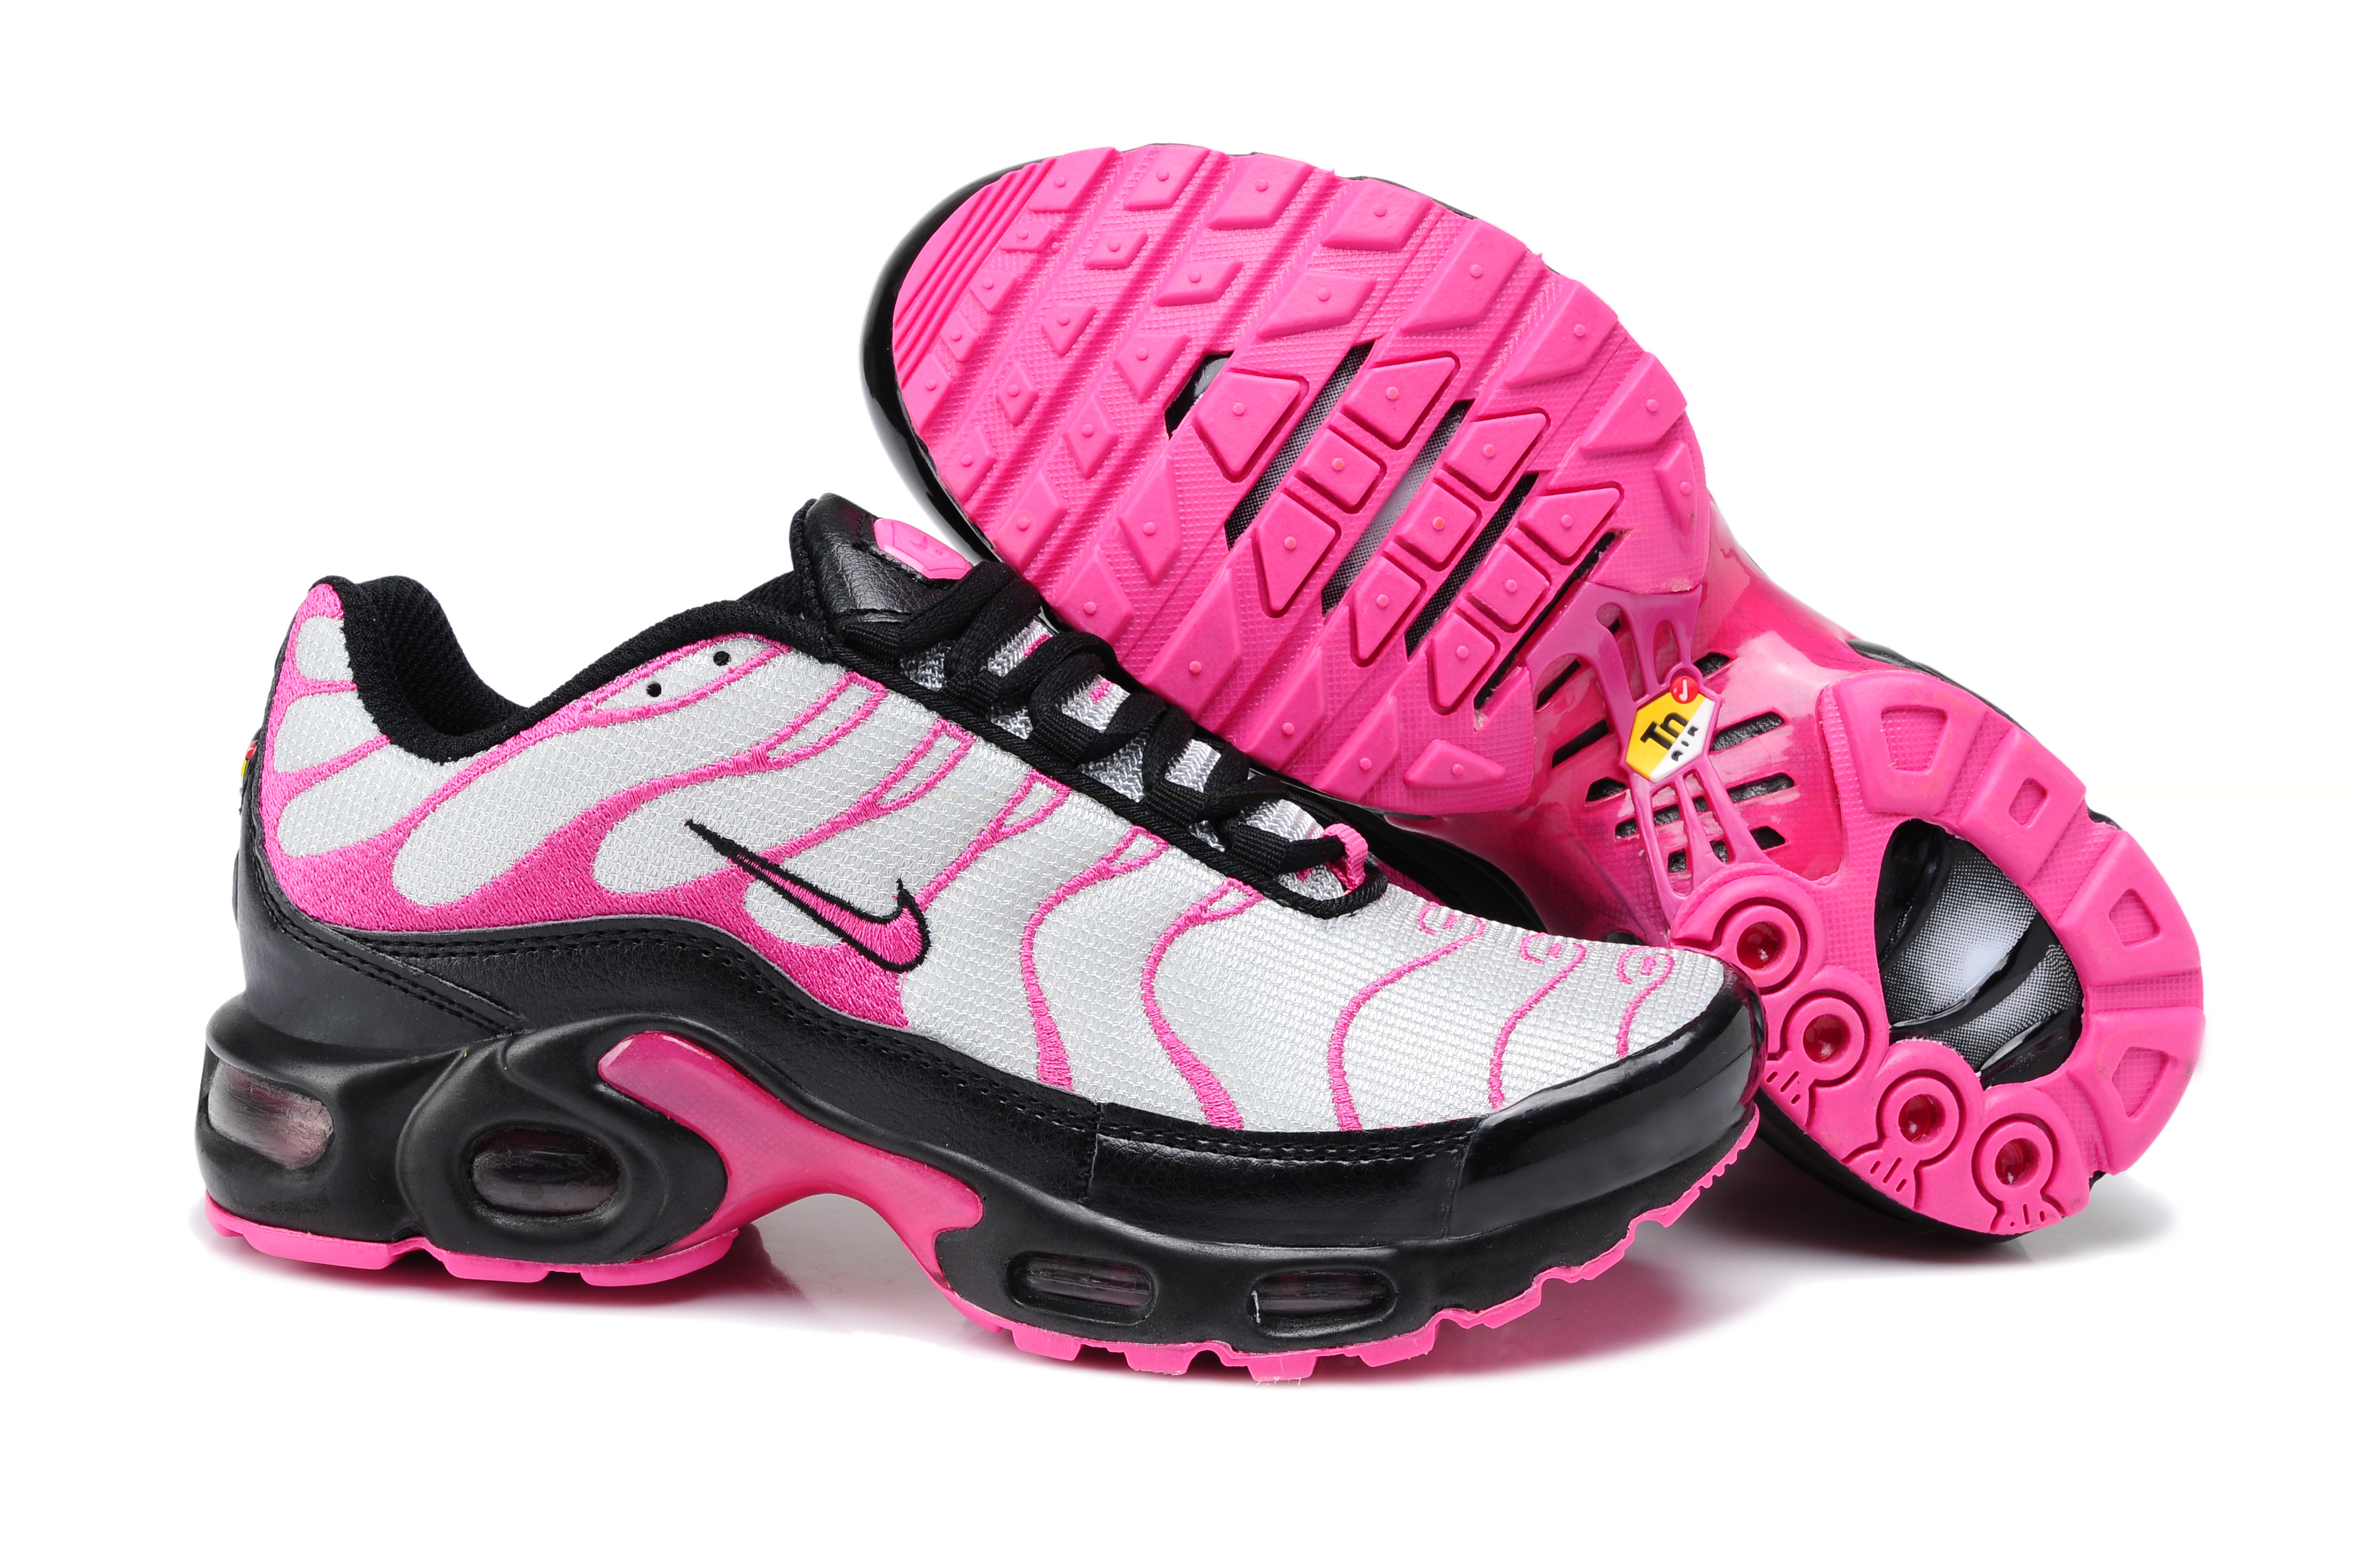 official photos 684cf 7730f Nike TN 2016 Femme Homme Nouveaux Femme nike air max chaussure nike air max  180 Pas